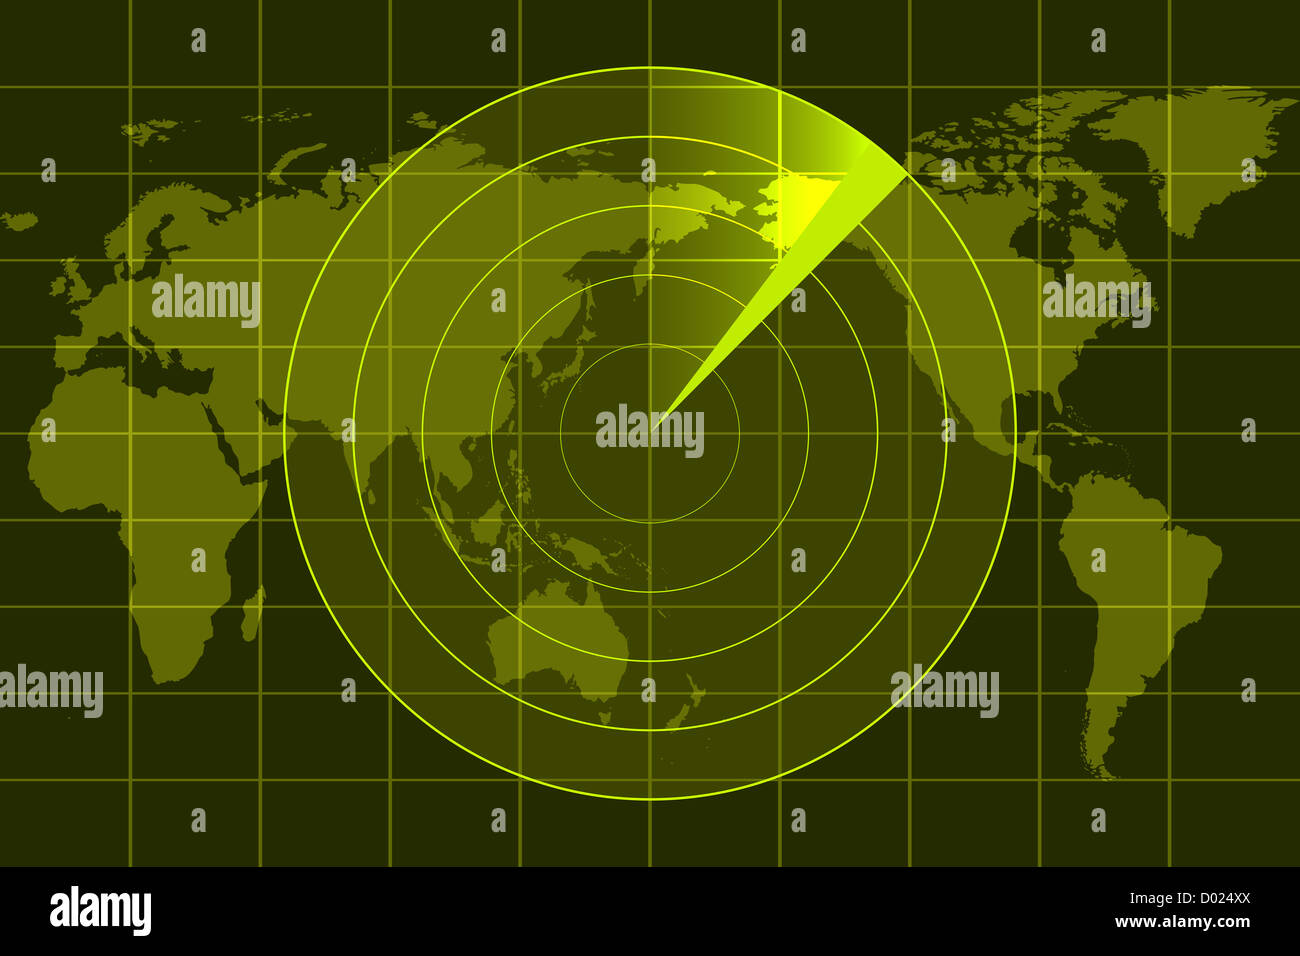 illustration of radar - Stock Image